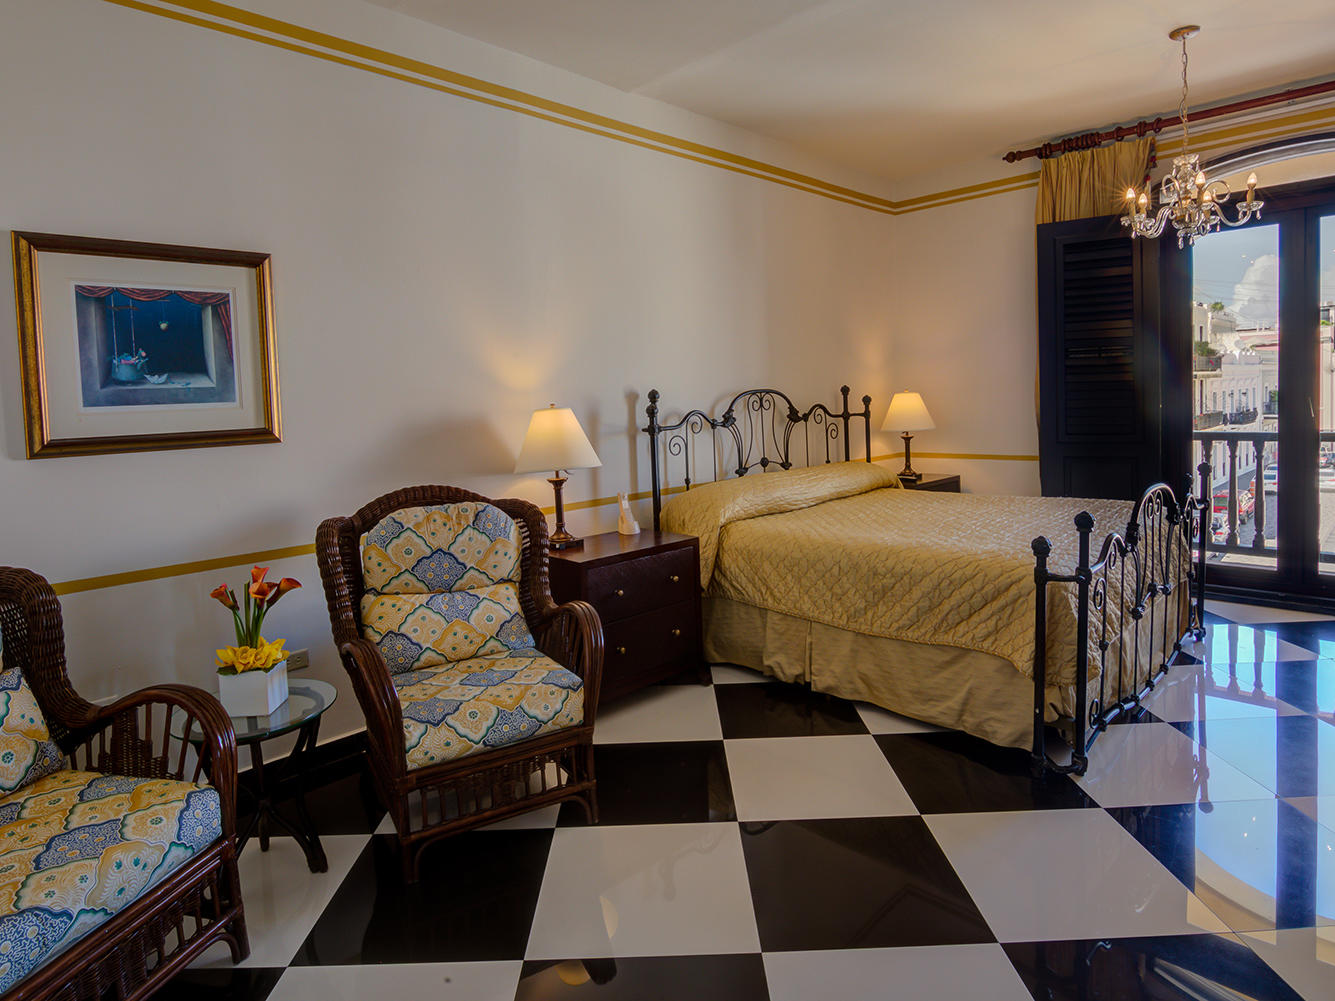 Pablo Casals Bedroom